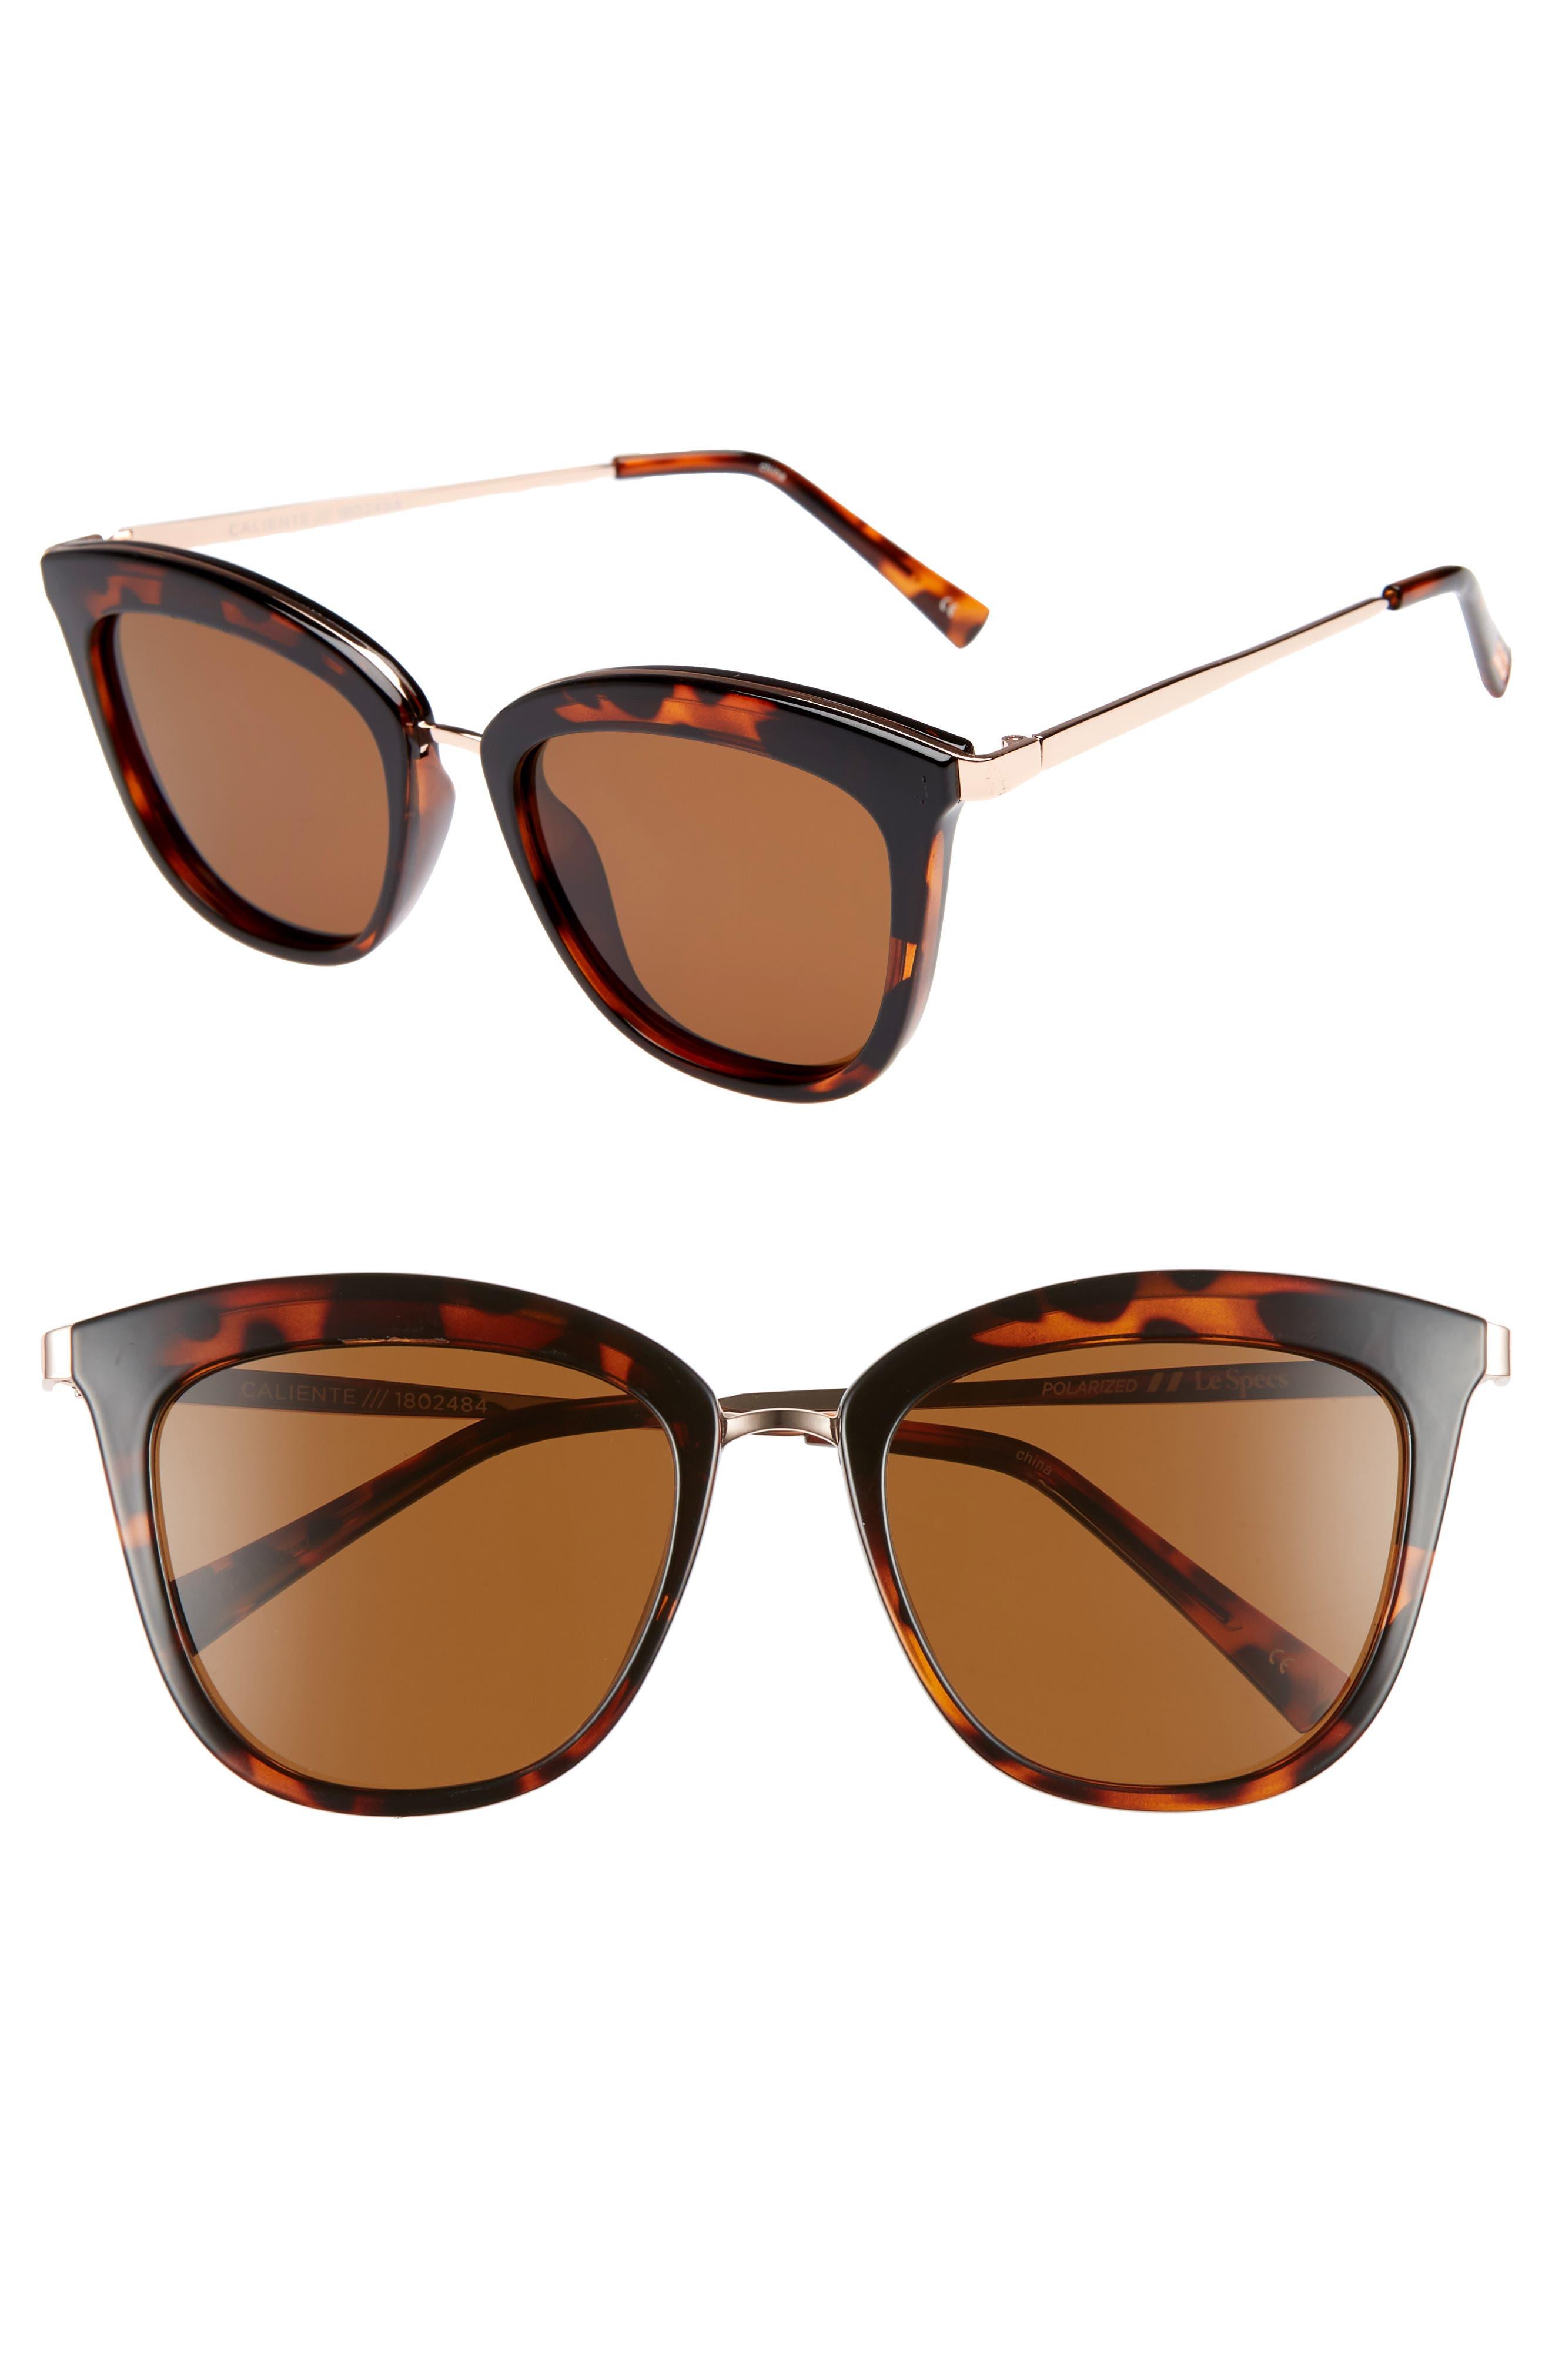 Caliente 53mm Polarized Cat Eye Sunglasses